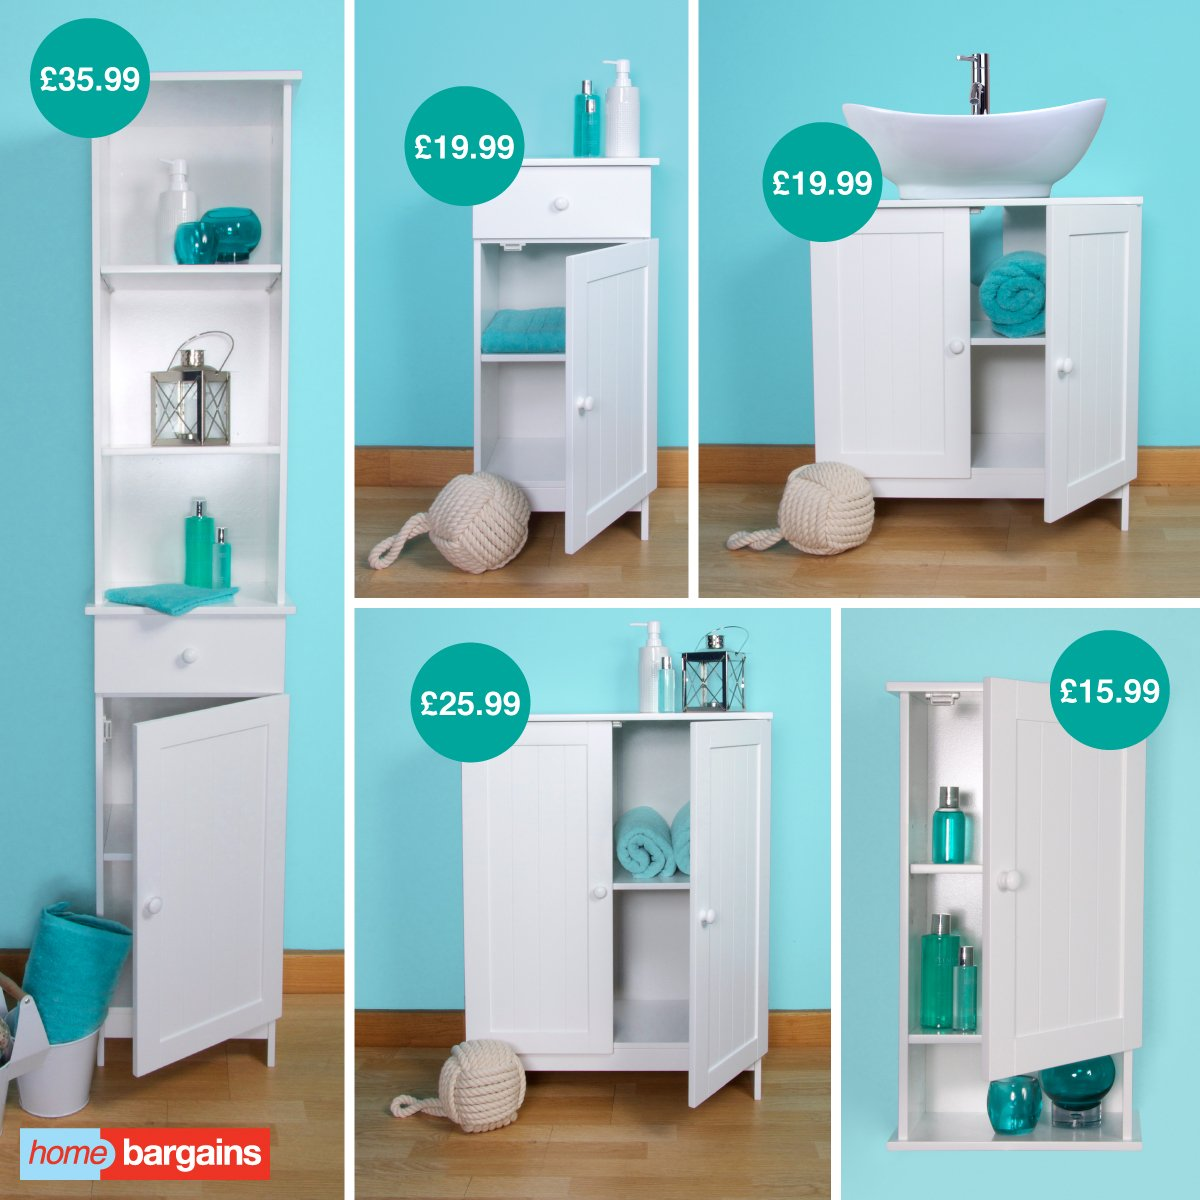 Home bargains bathroom cabinets - Home Bargains On Twitter Who Loves Our Prestigious Bathrooms Range Available In Store Online Https T Co Xtnarhxjtg Https T Co 3pydgh0ydd